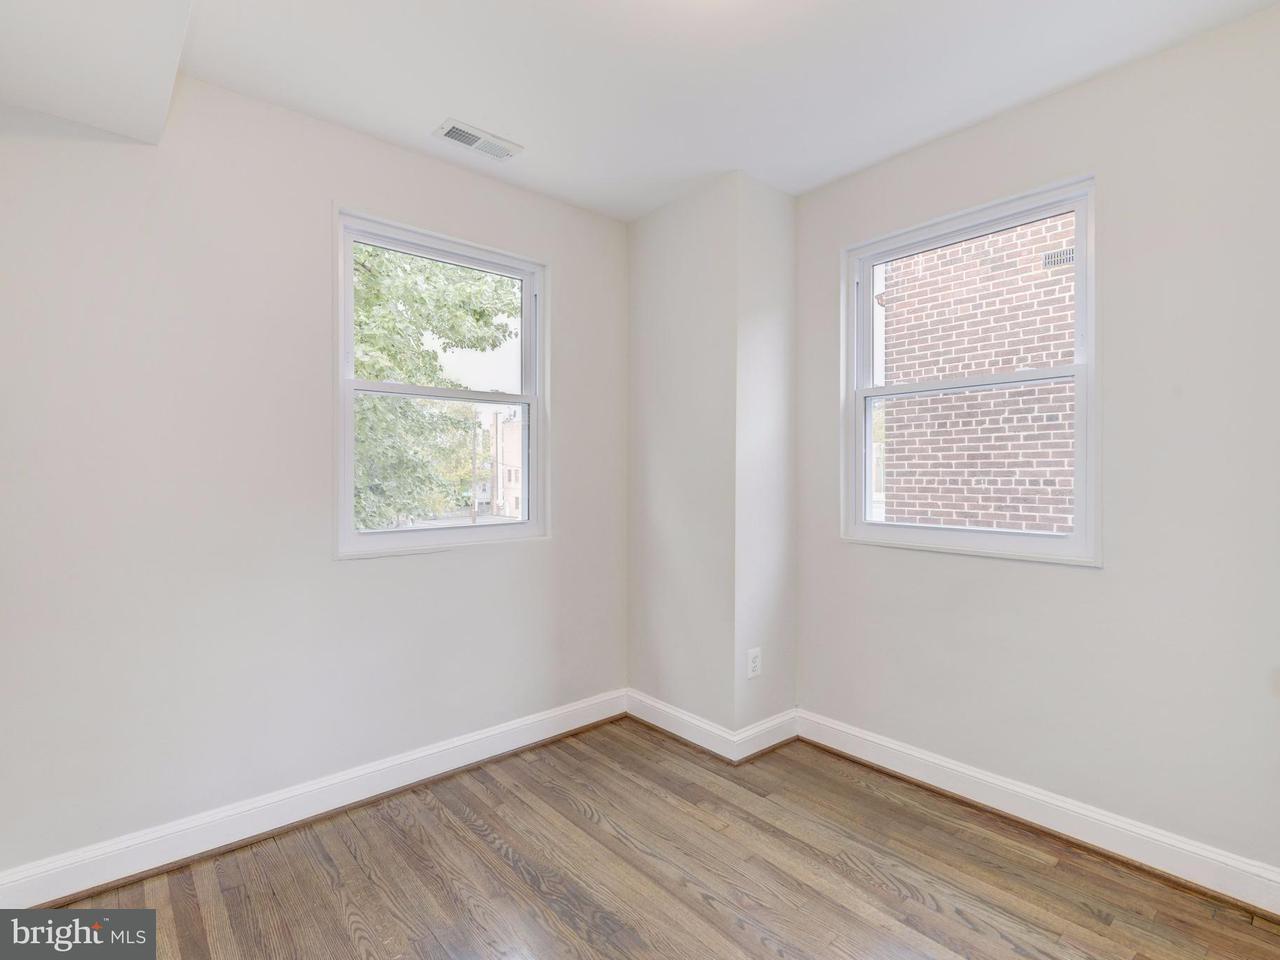 Additional photo for property listing at 2528 S Dakota Ave Ne 2528 S Dakota Ave Ne Washington, Distrito De Columbia 20018 Estados Unidos